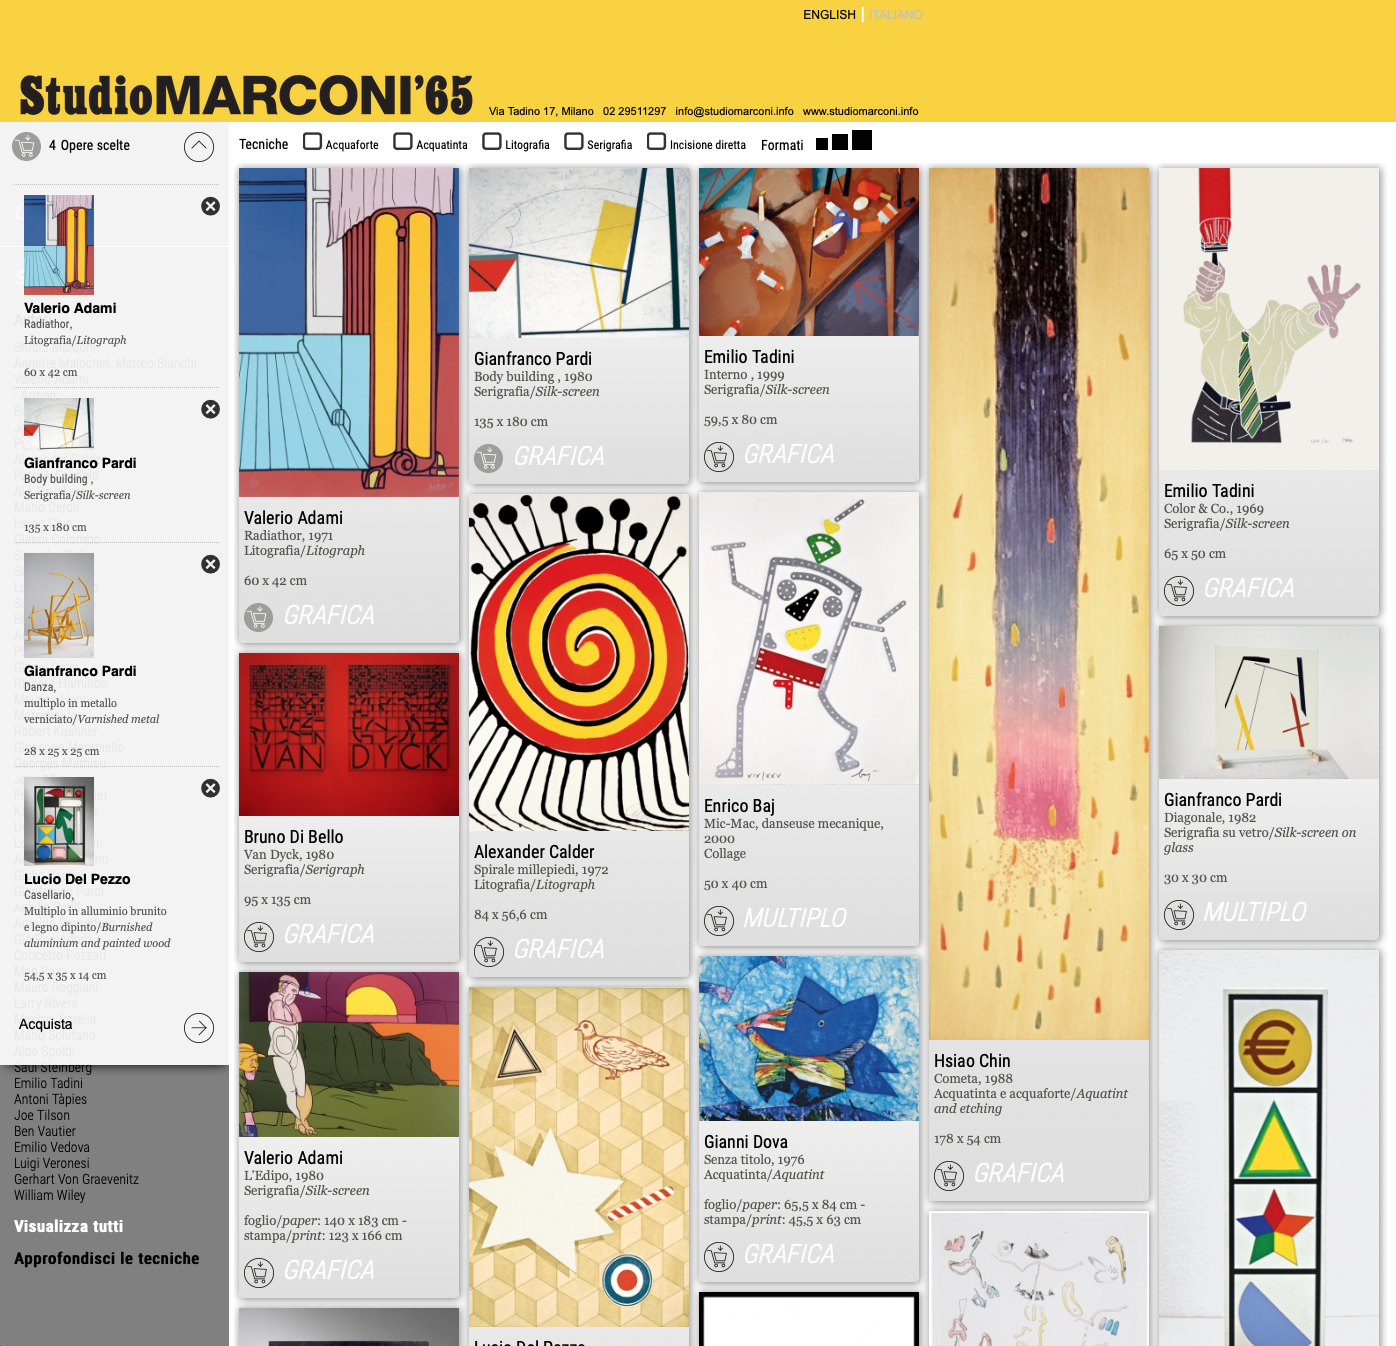 Studio Marconi '65